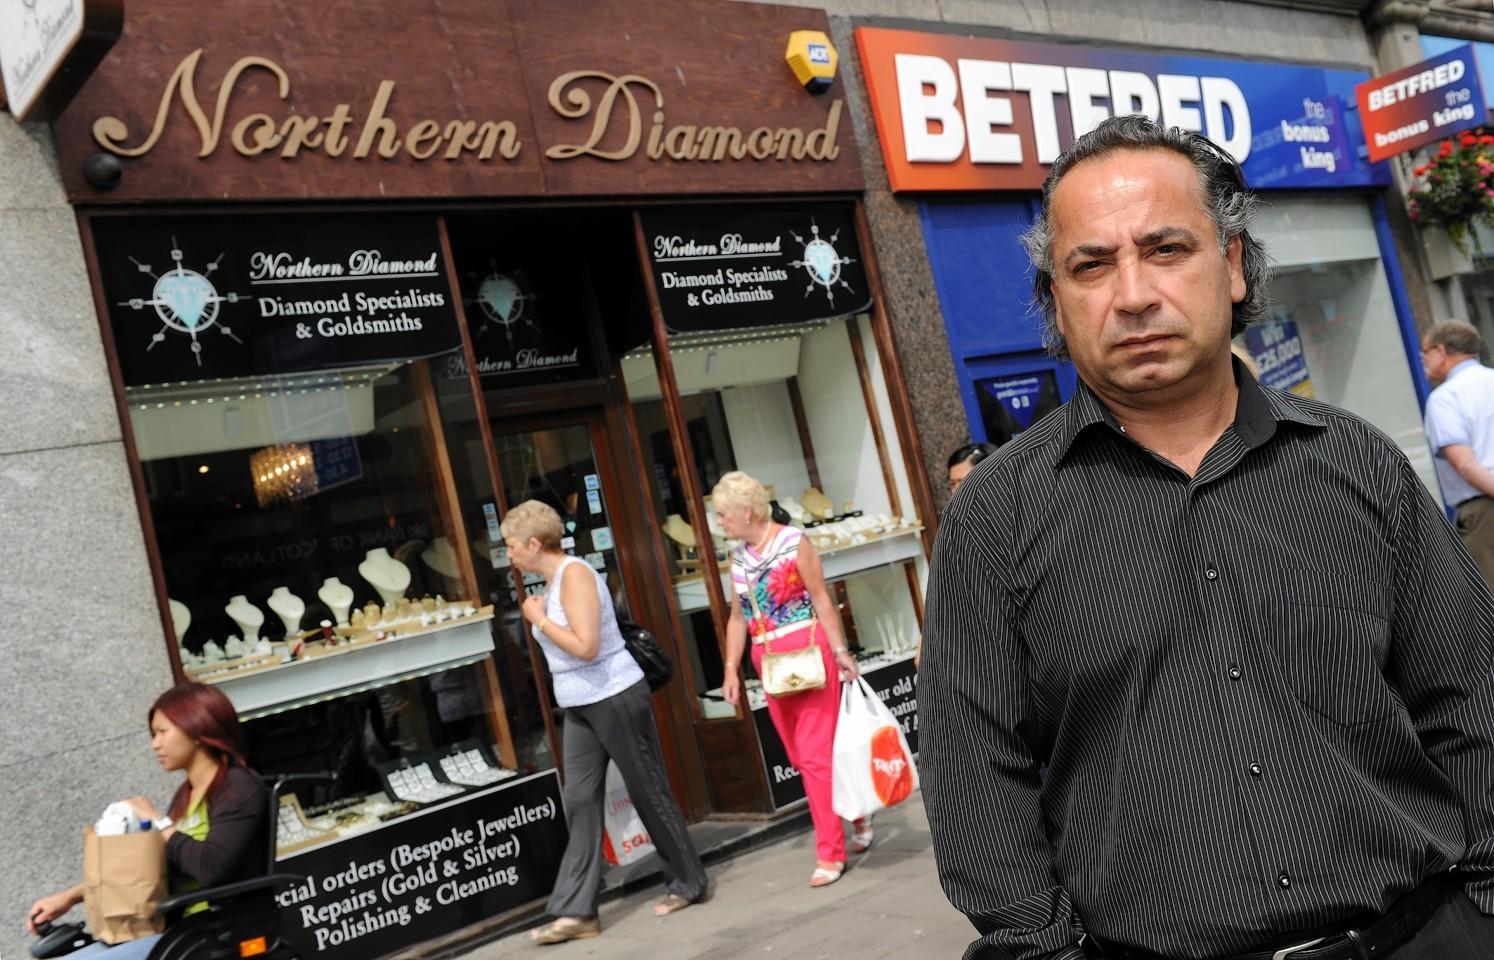 Oscar Ozdaslar outside his store Northern Diamonds